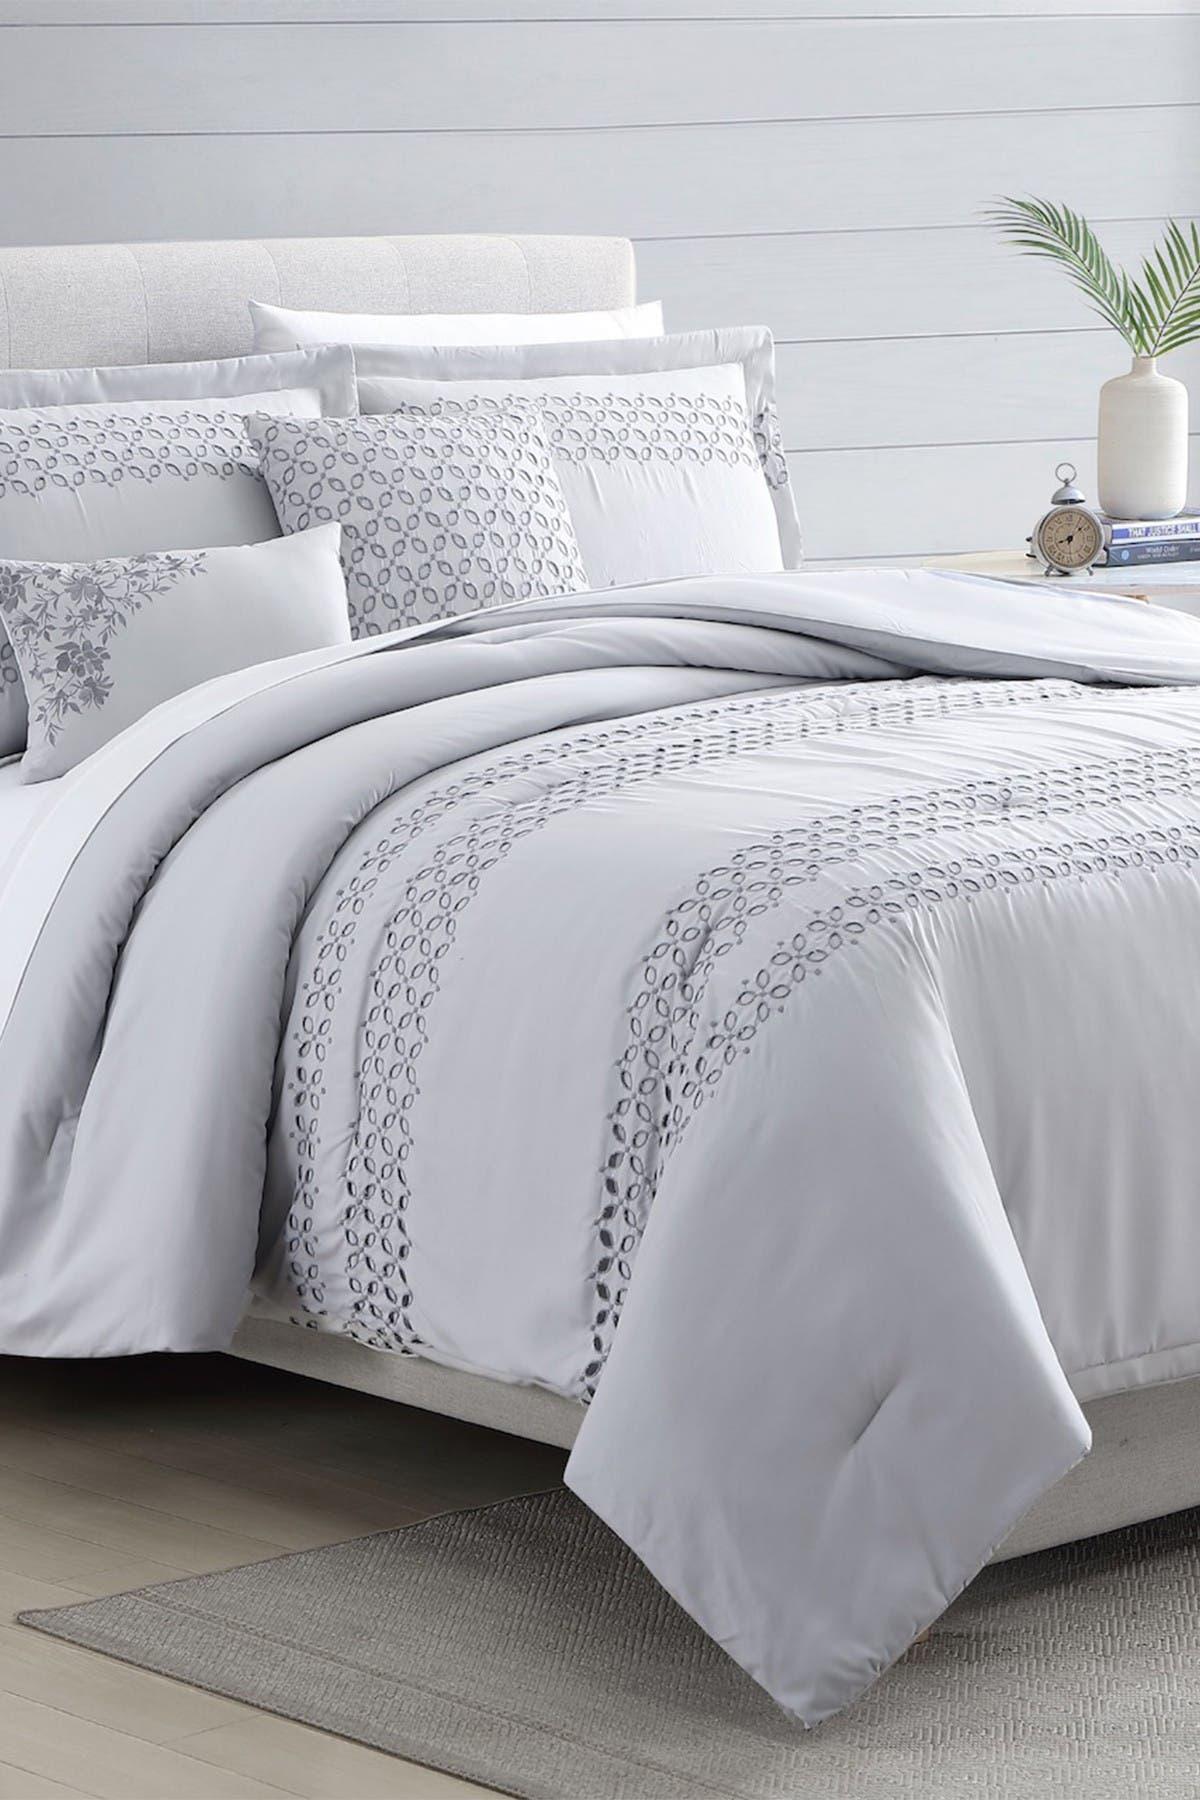 Modern Threads 5-Piece Embroidered Comforter Set - Queen at Nordstrom Rack